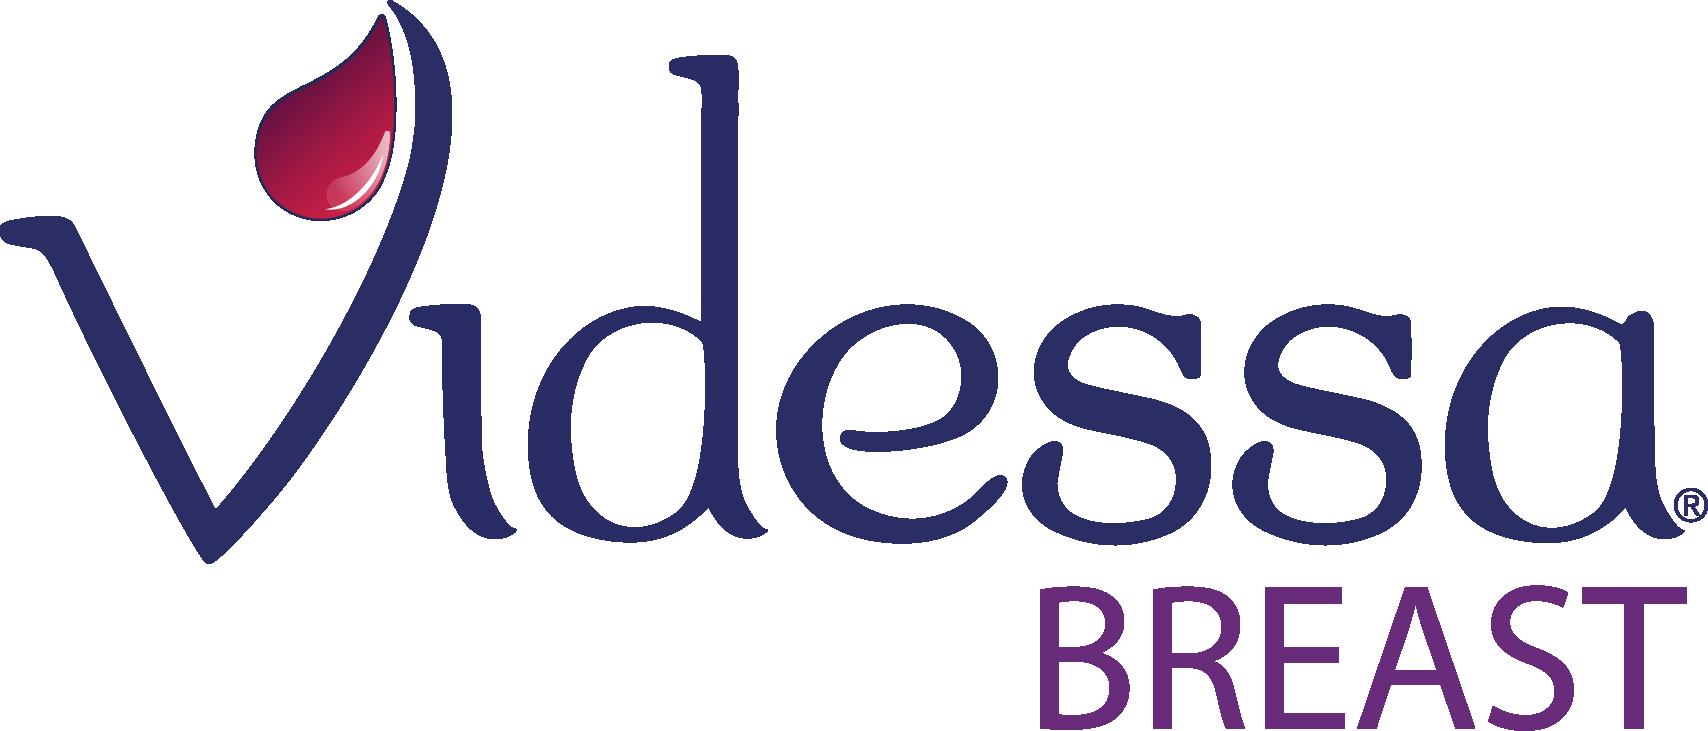 Videssa_Breast_RGB_Logo.png